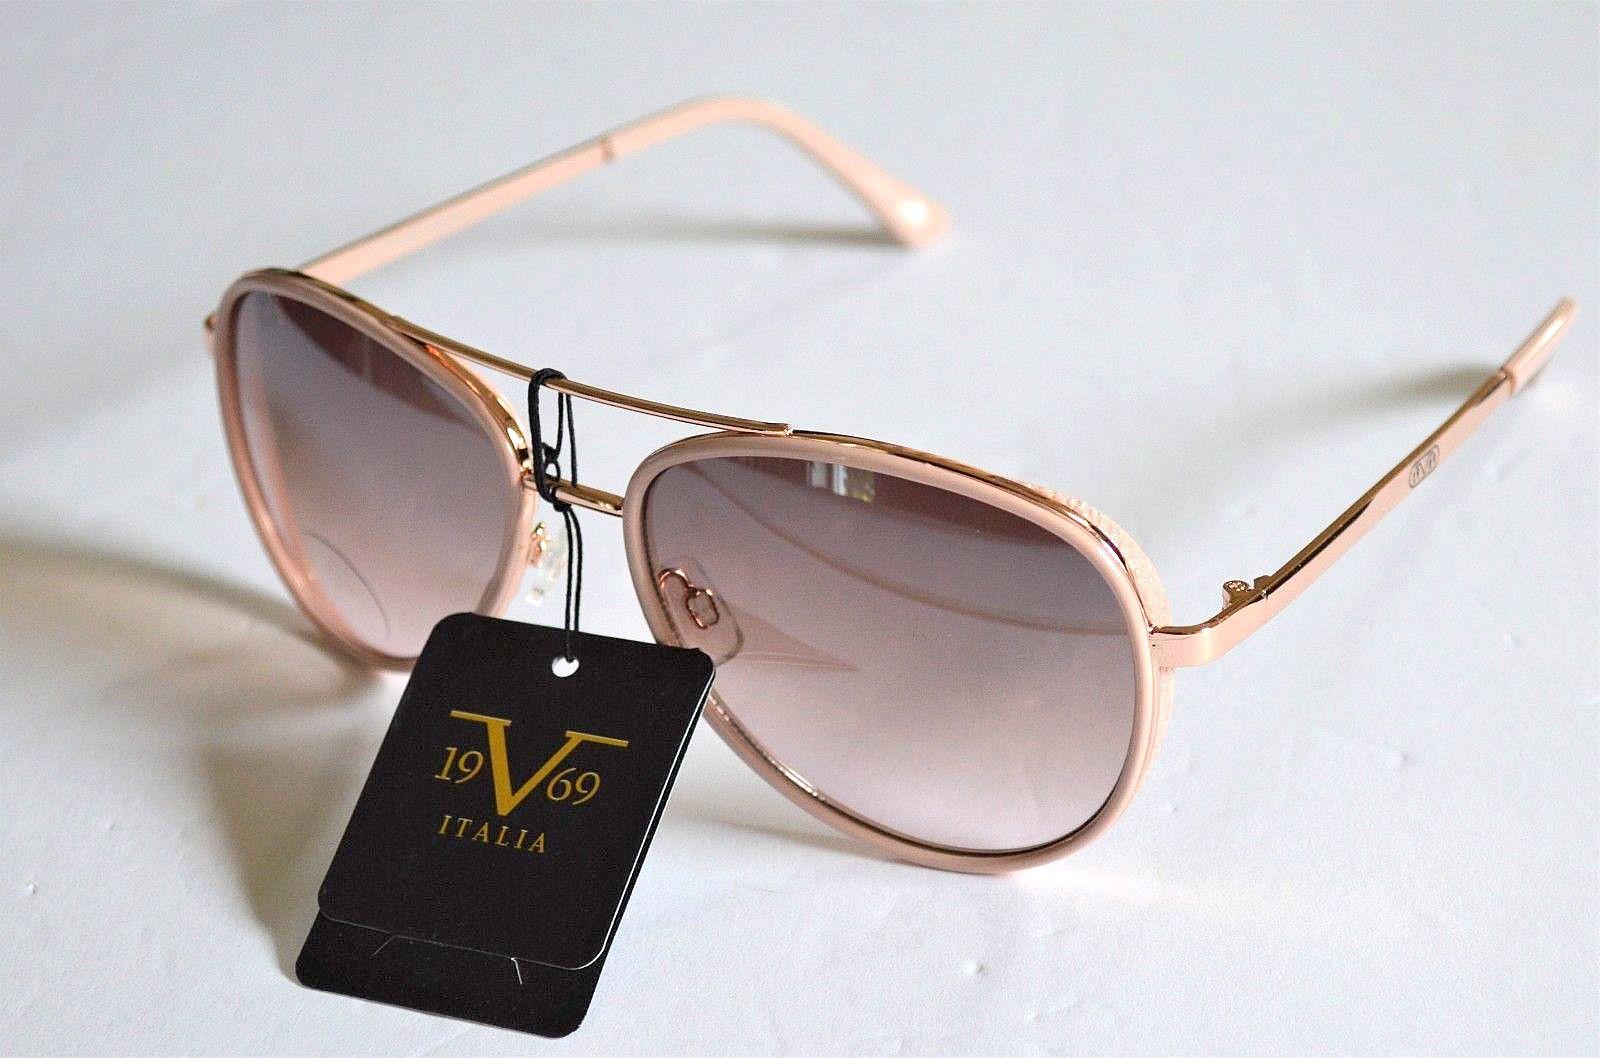 2558a0a7c901 New V1969 ITALIA Sunglasses VERSACE 1969 Abbigliamento